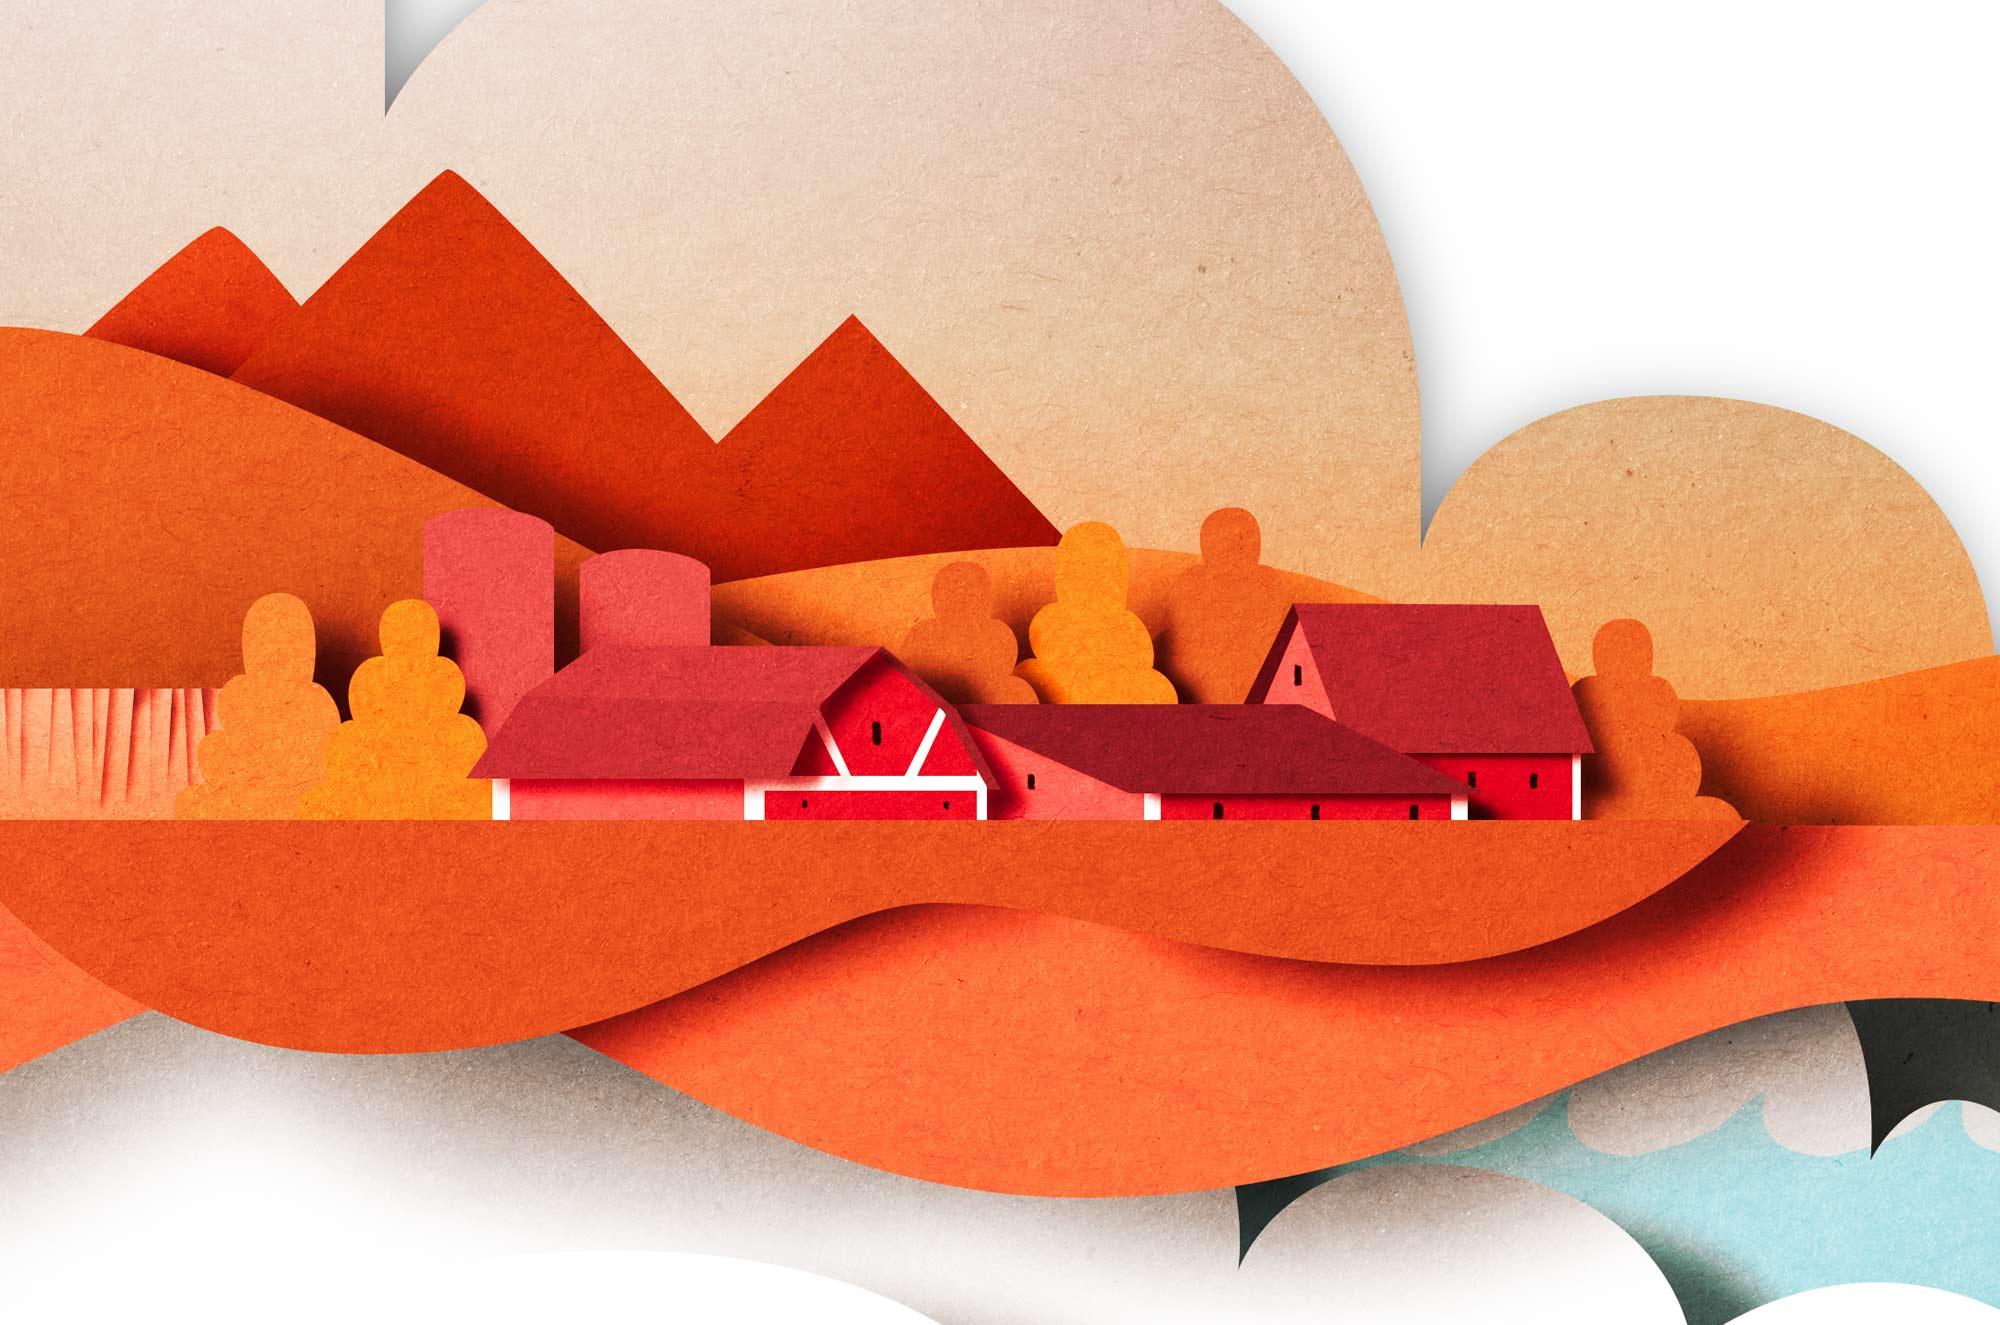 Papercut illustration. Editorial illustration. Paper art. Cut out paper illustration. Craft. Environment.